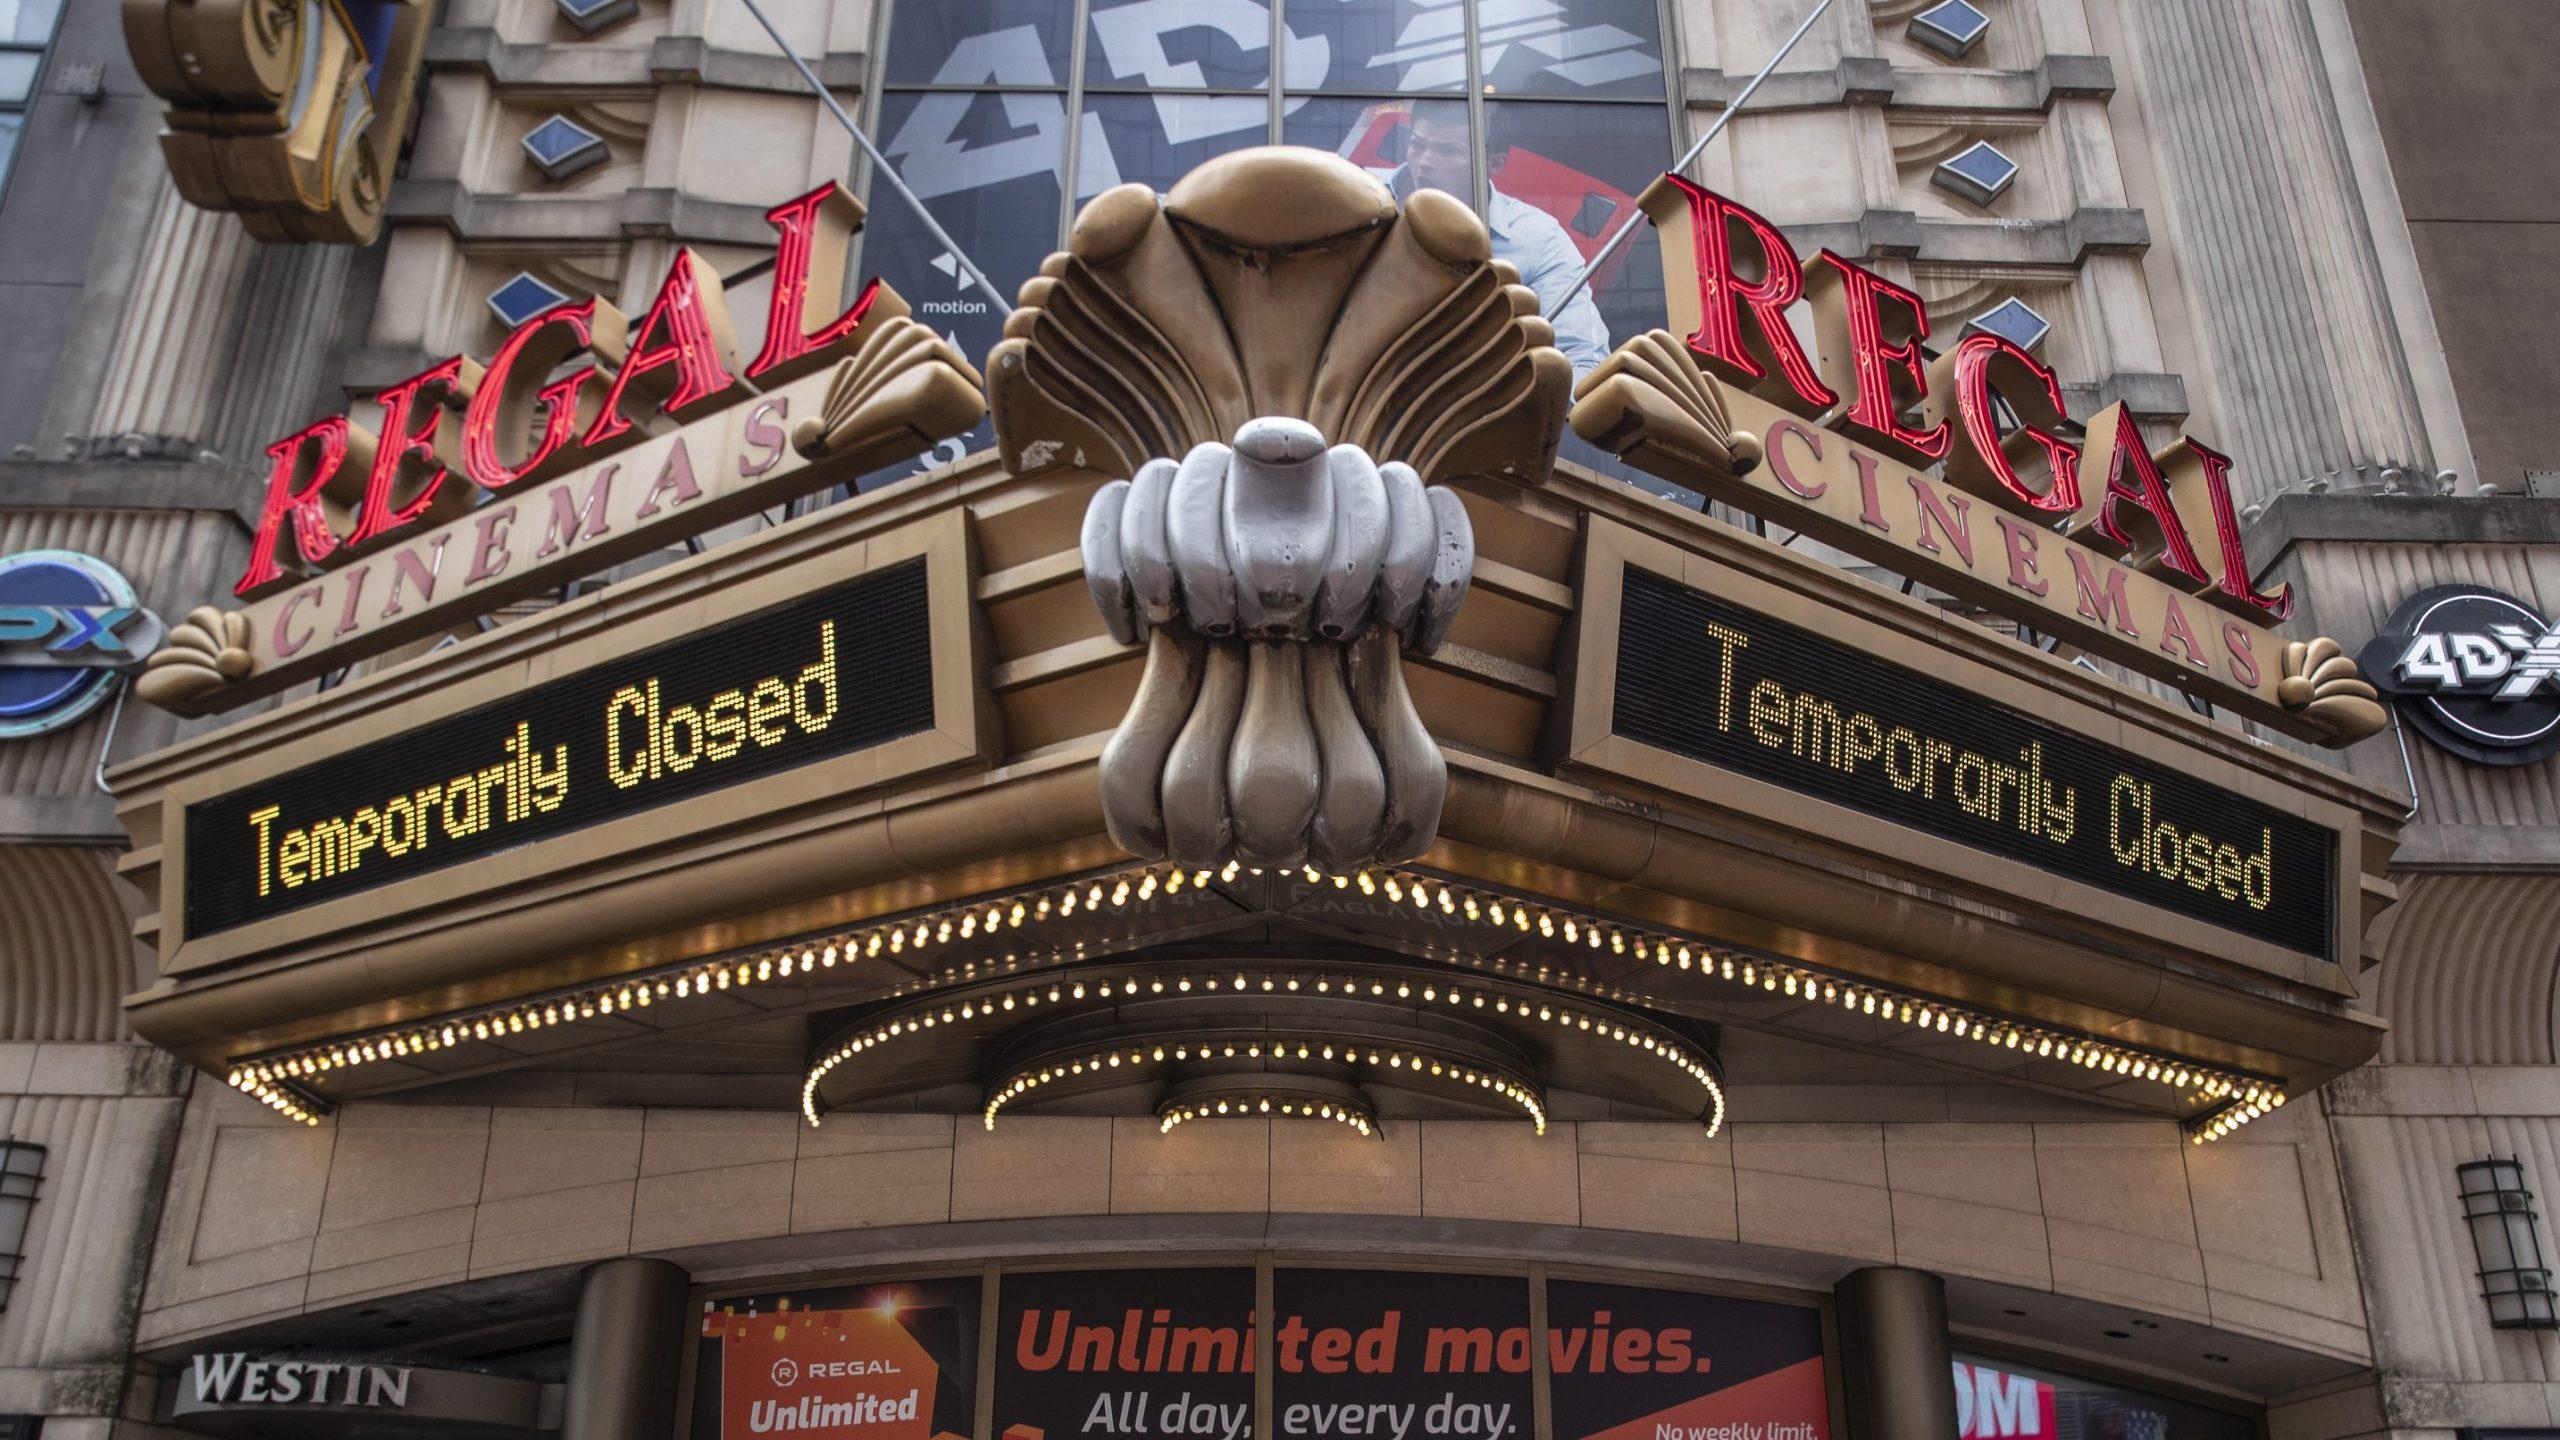 Regal Cinemas Halloween Events 2020 Regal Cinemas owner considering closure of all theaters worldwide